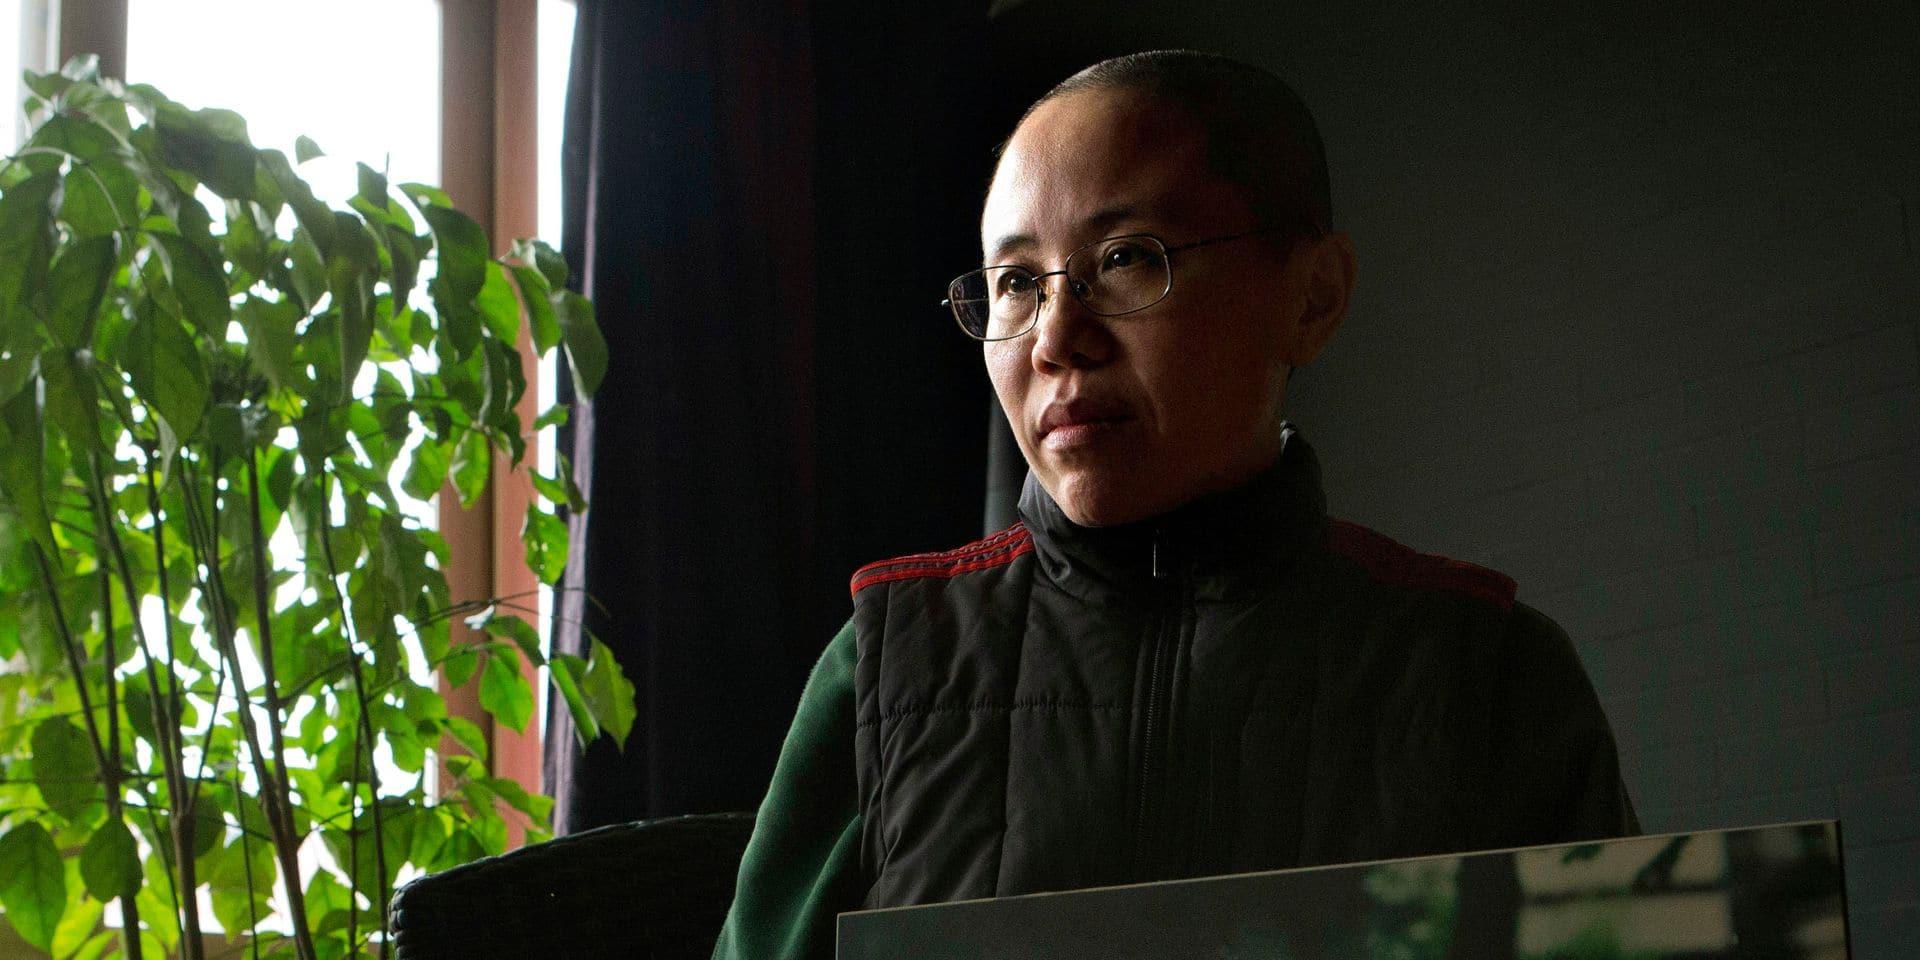 La veuve du prix Nobel de la paix Liu Xiaobo a quitté la Chine